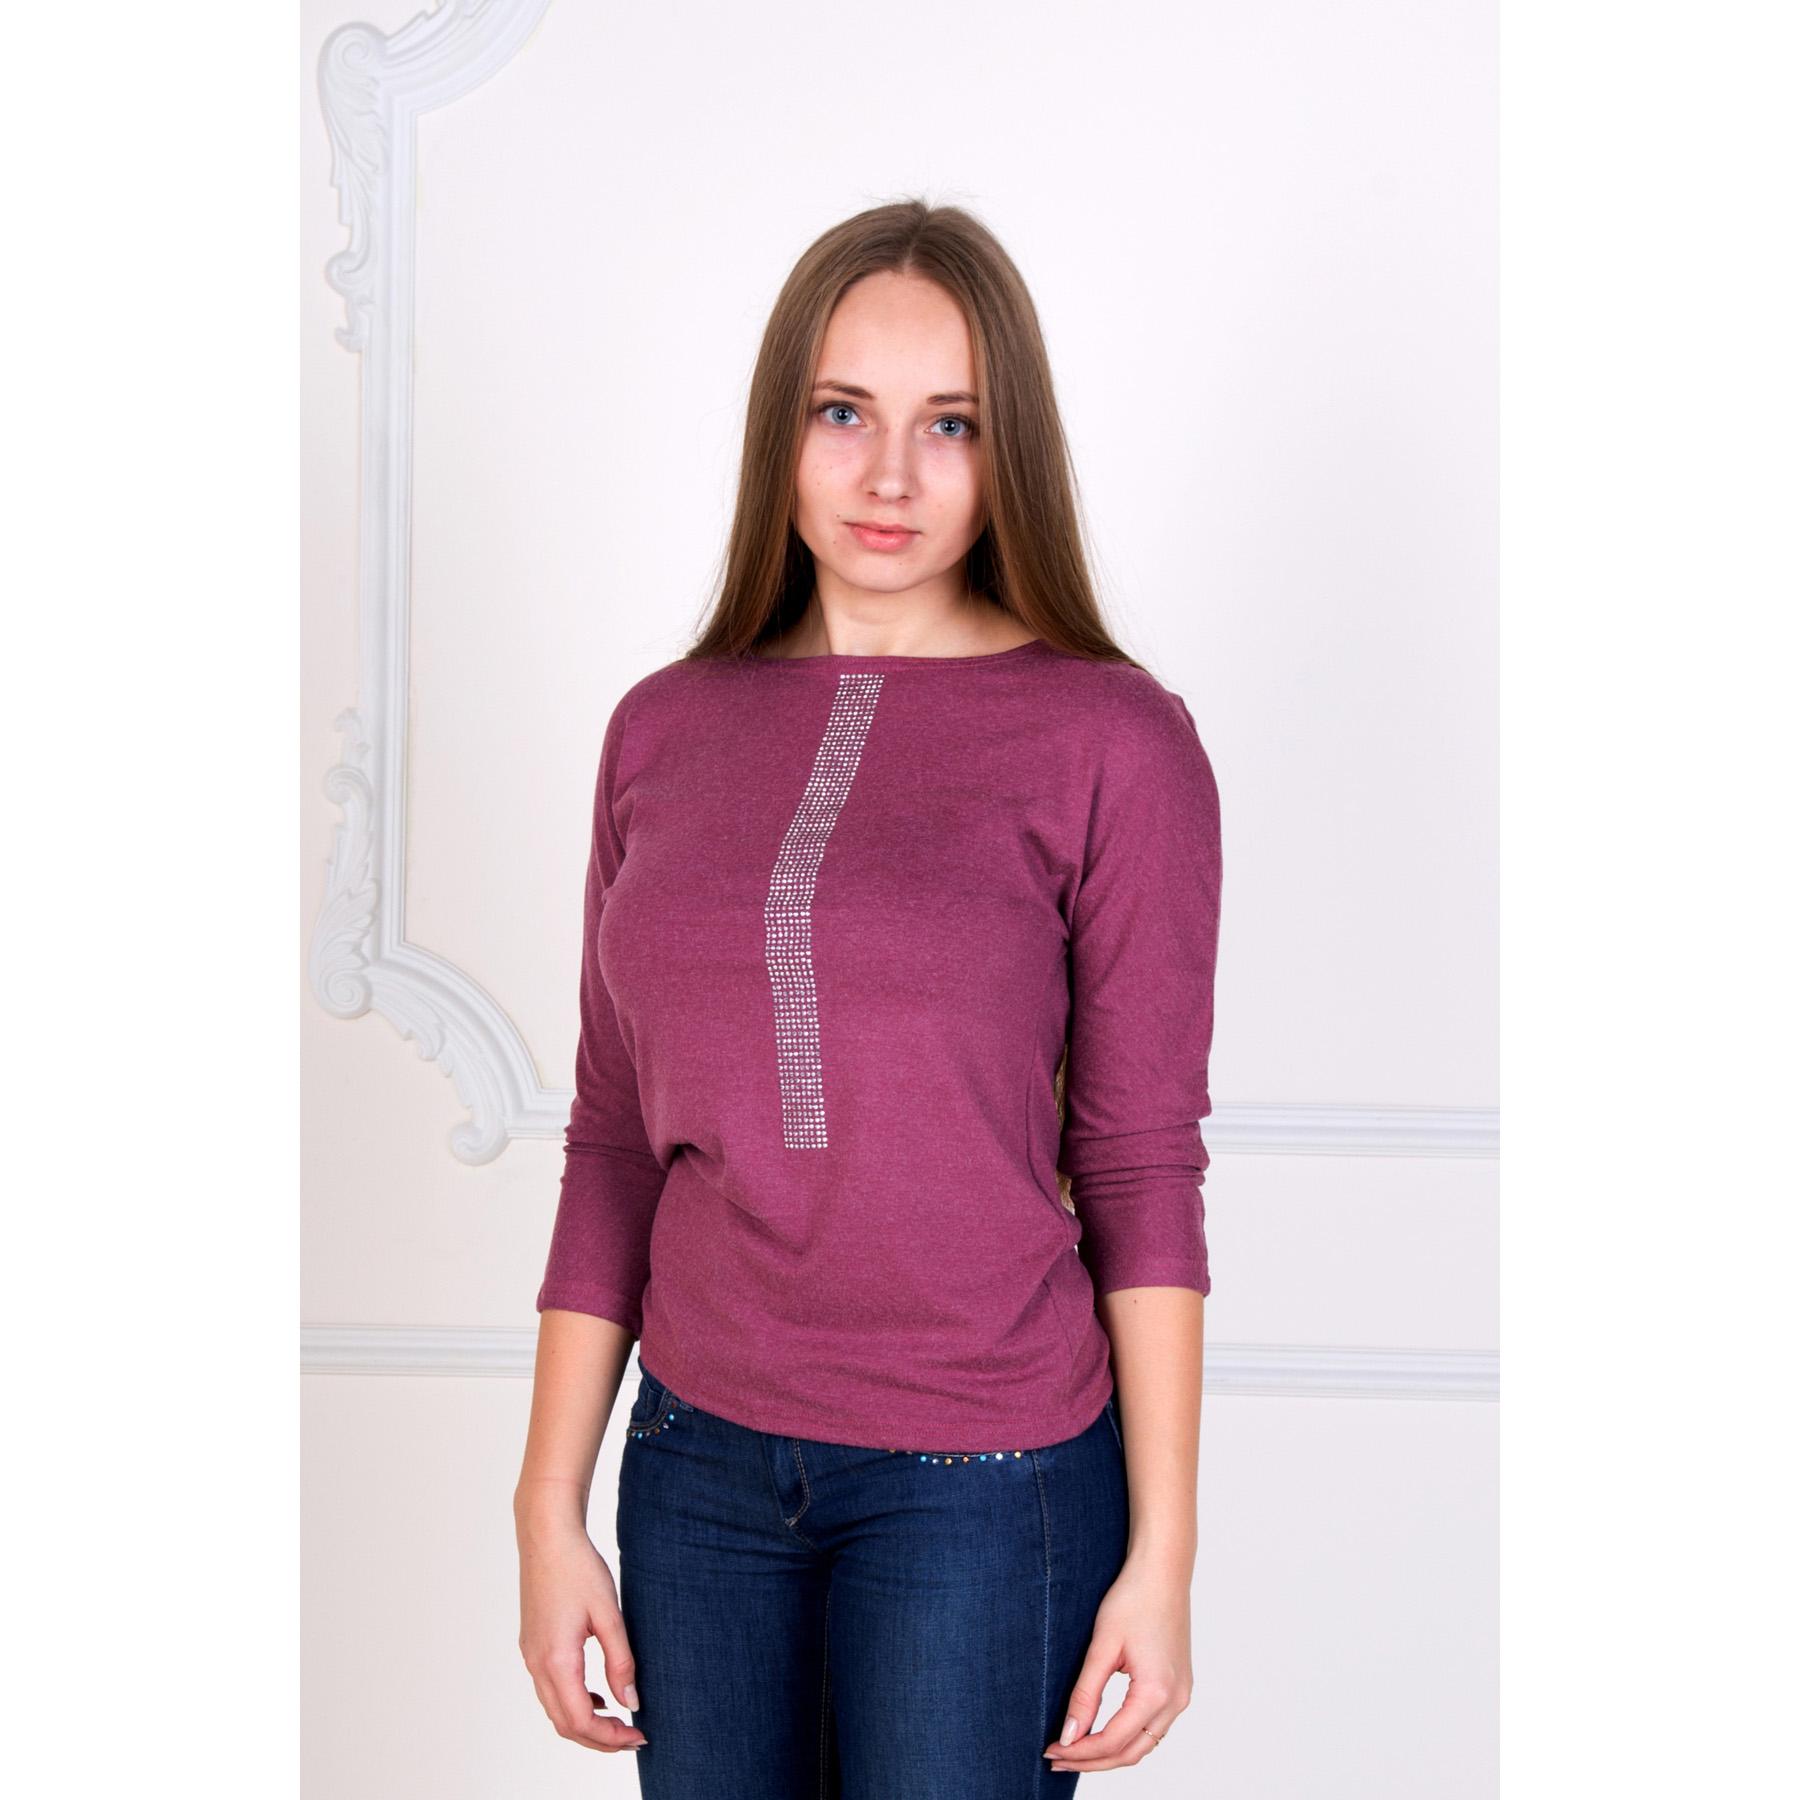 Женская блуза Симфония Брусничный, размер 52Блузы<br>Обхват груди: 104 см <br>Обхват талии: 85 см <br>Обхват бедер: 112 см <br>Рост: 167 см<br><br>Тип: Жен. блуза<br>Размер: 52<br>Материал: Хамур